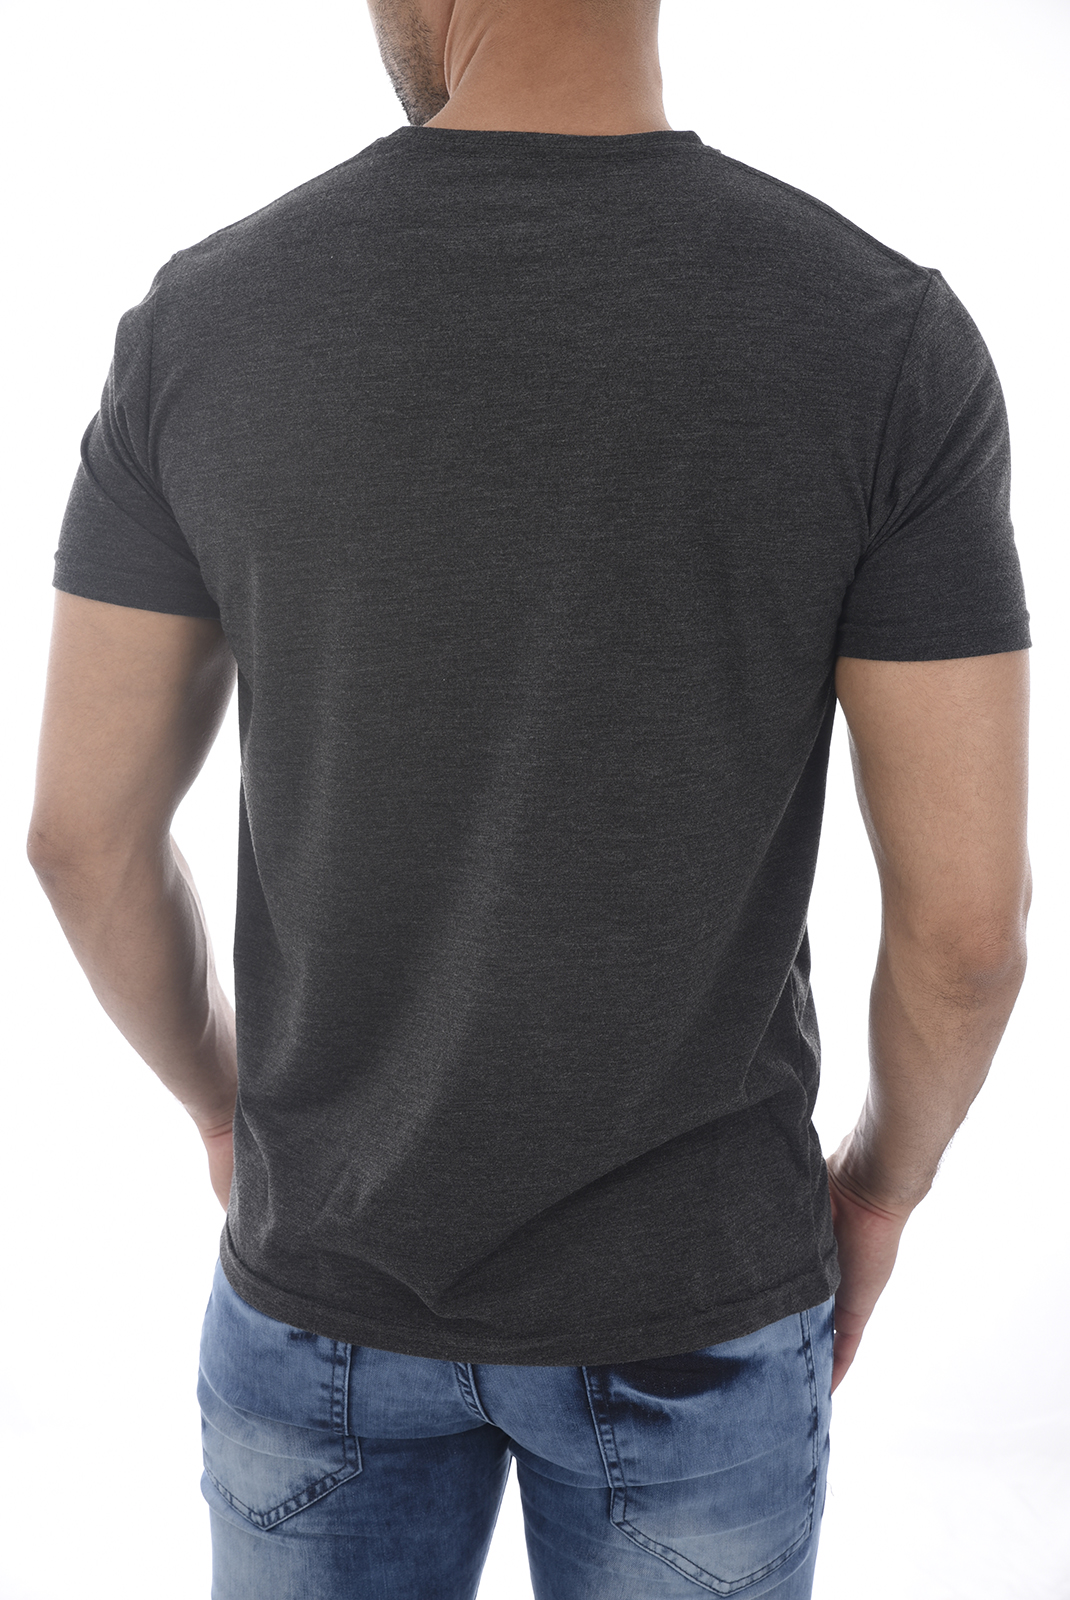 Tee-shirts  Versace 19.69 FORLI GRIS FONCE